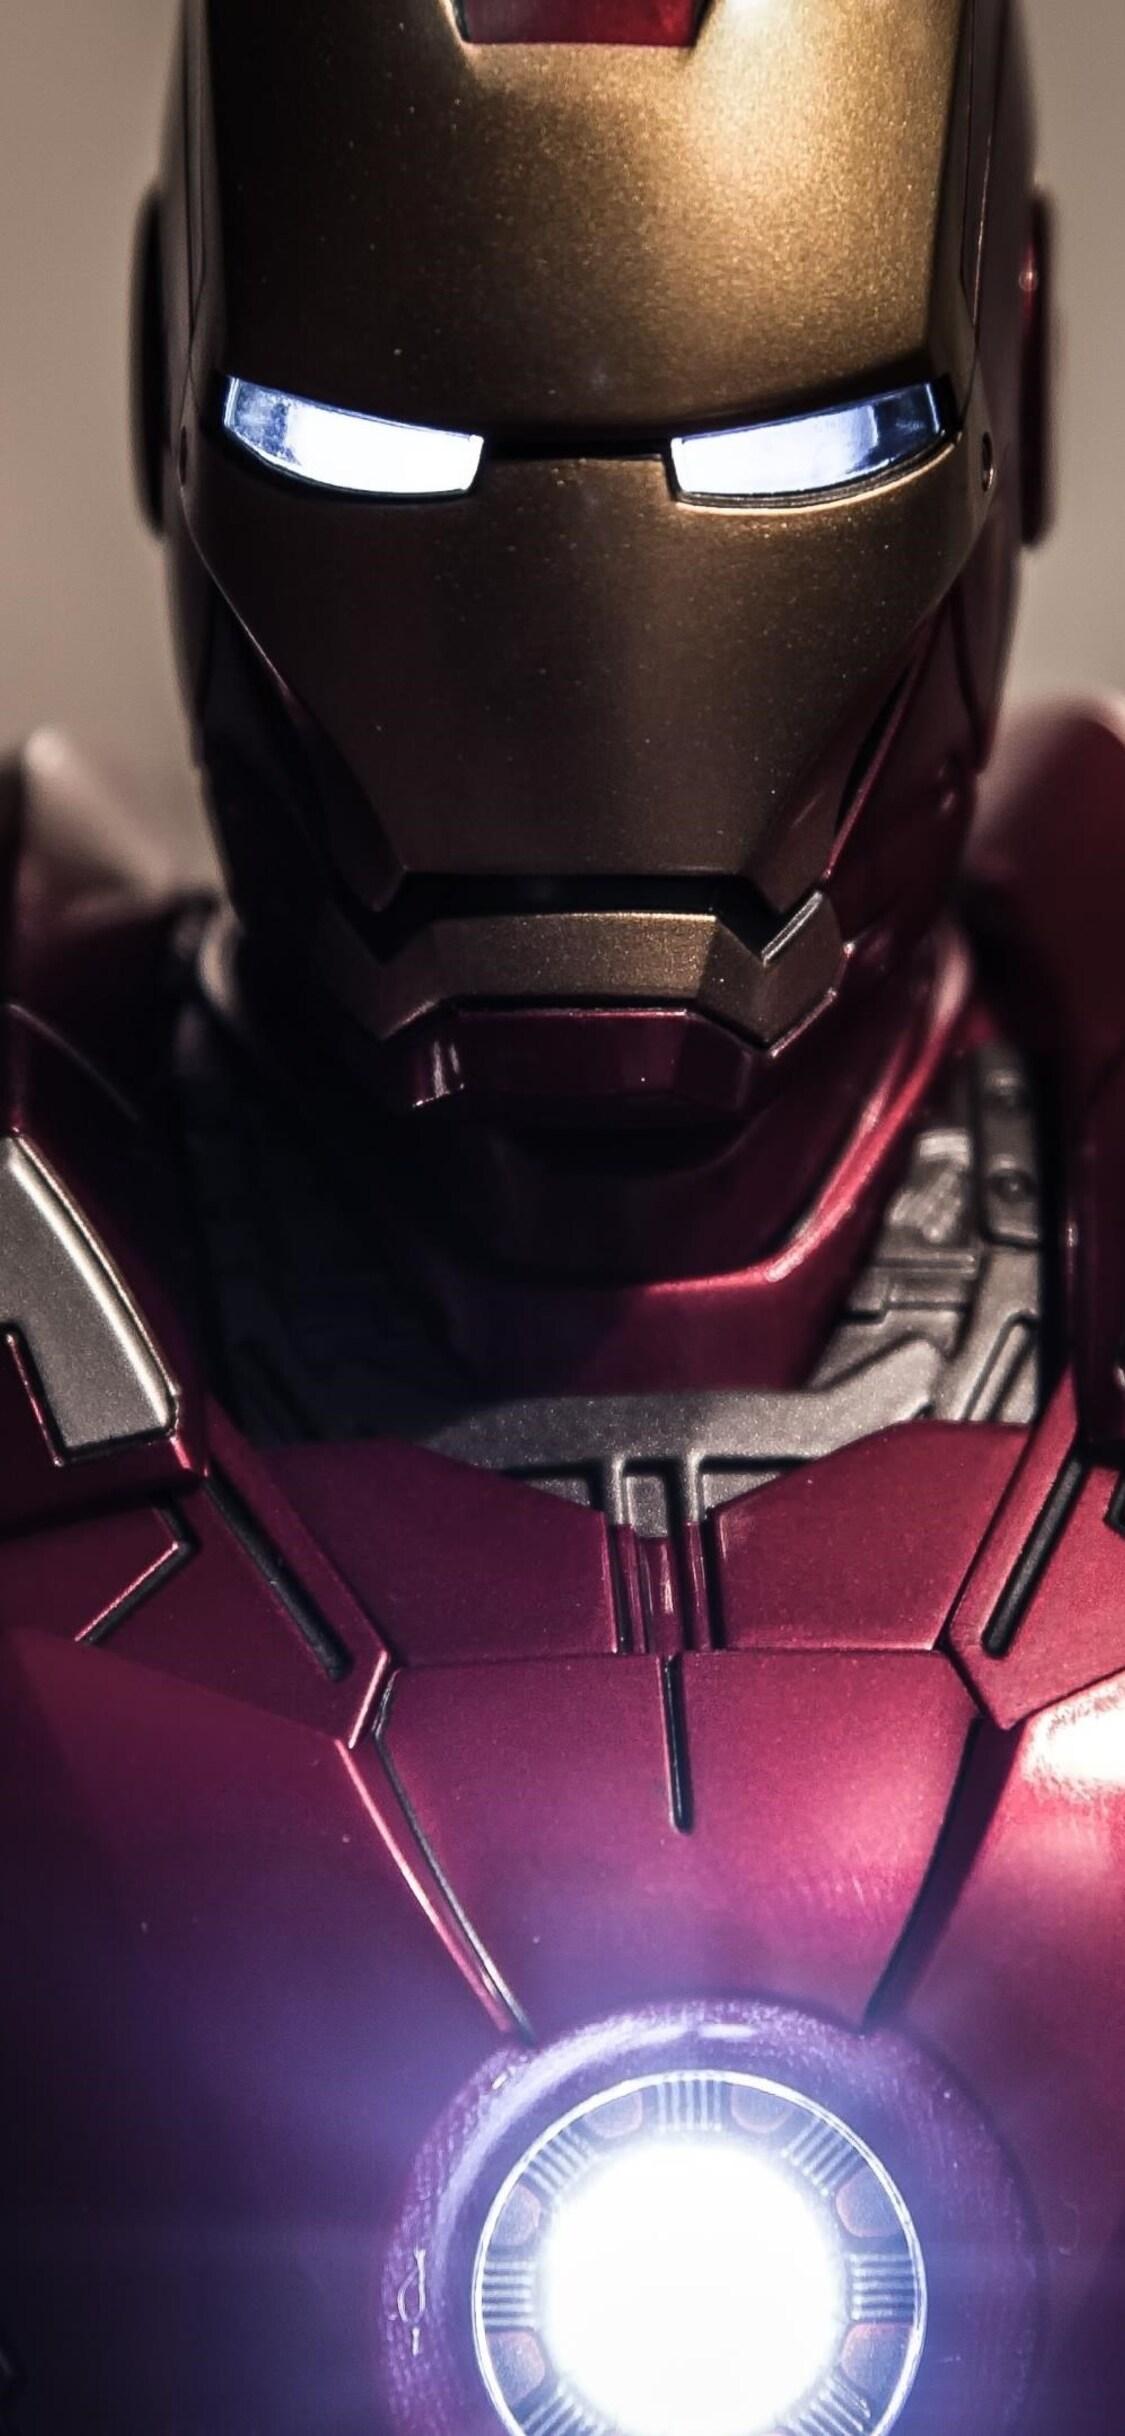 1125x2436 Iron Man Suit Iphone Xs Iphone 10 Iphone X Hd 4k